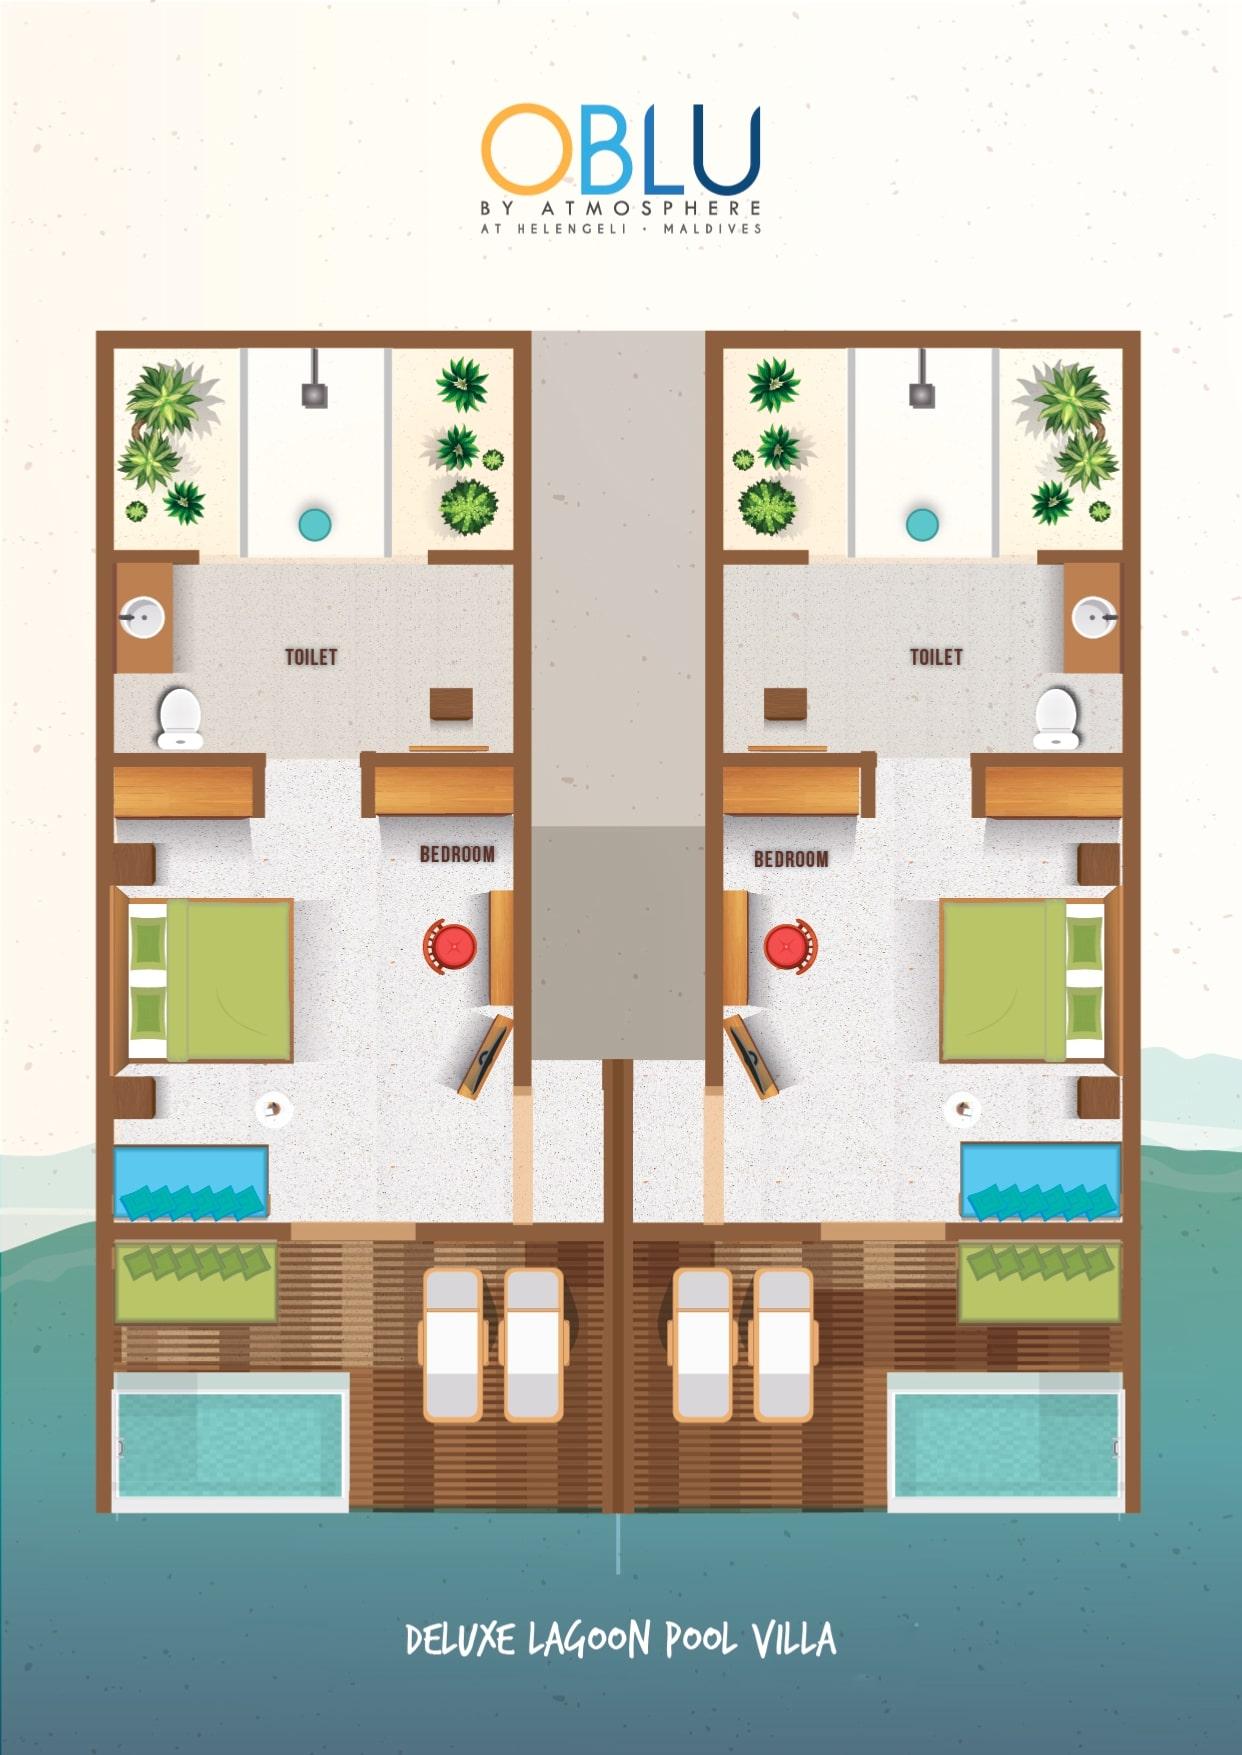 Мальдивы, отель OBLU by Atmosphere at Helengeli, план-схема номера Water Villa with Pool